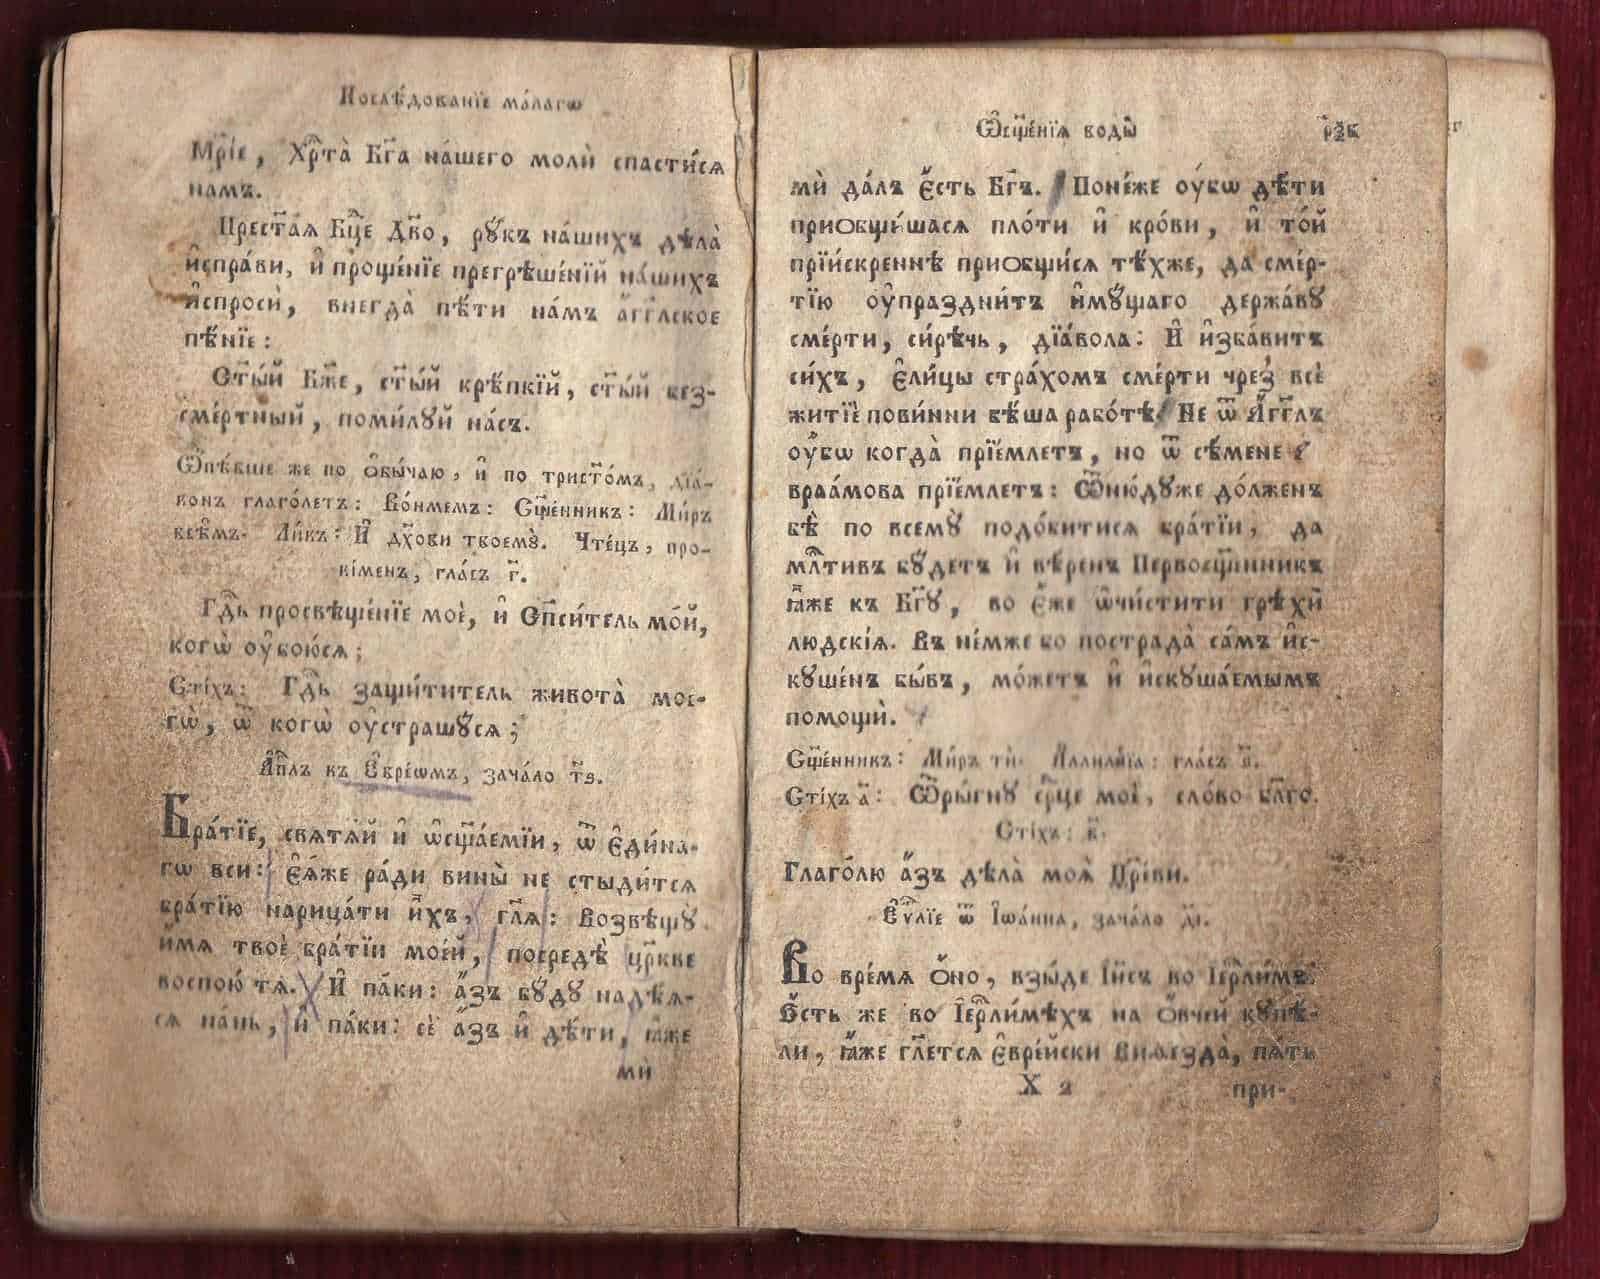 19c-Posledovanie-Acolouthia-e-Old-Slavonic-Inscribed-Manuscript-401146479031-7